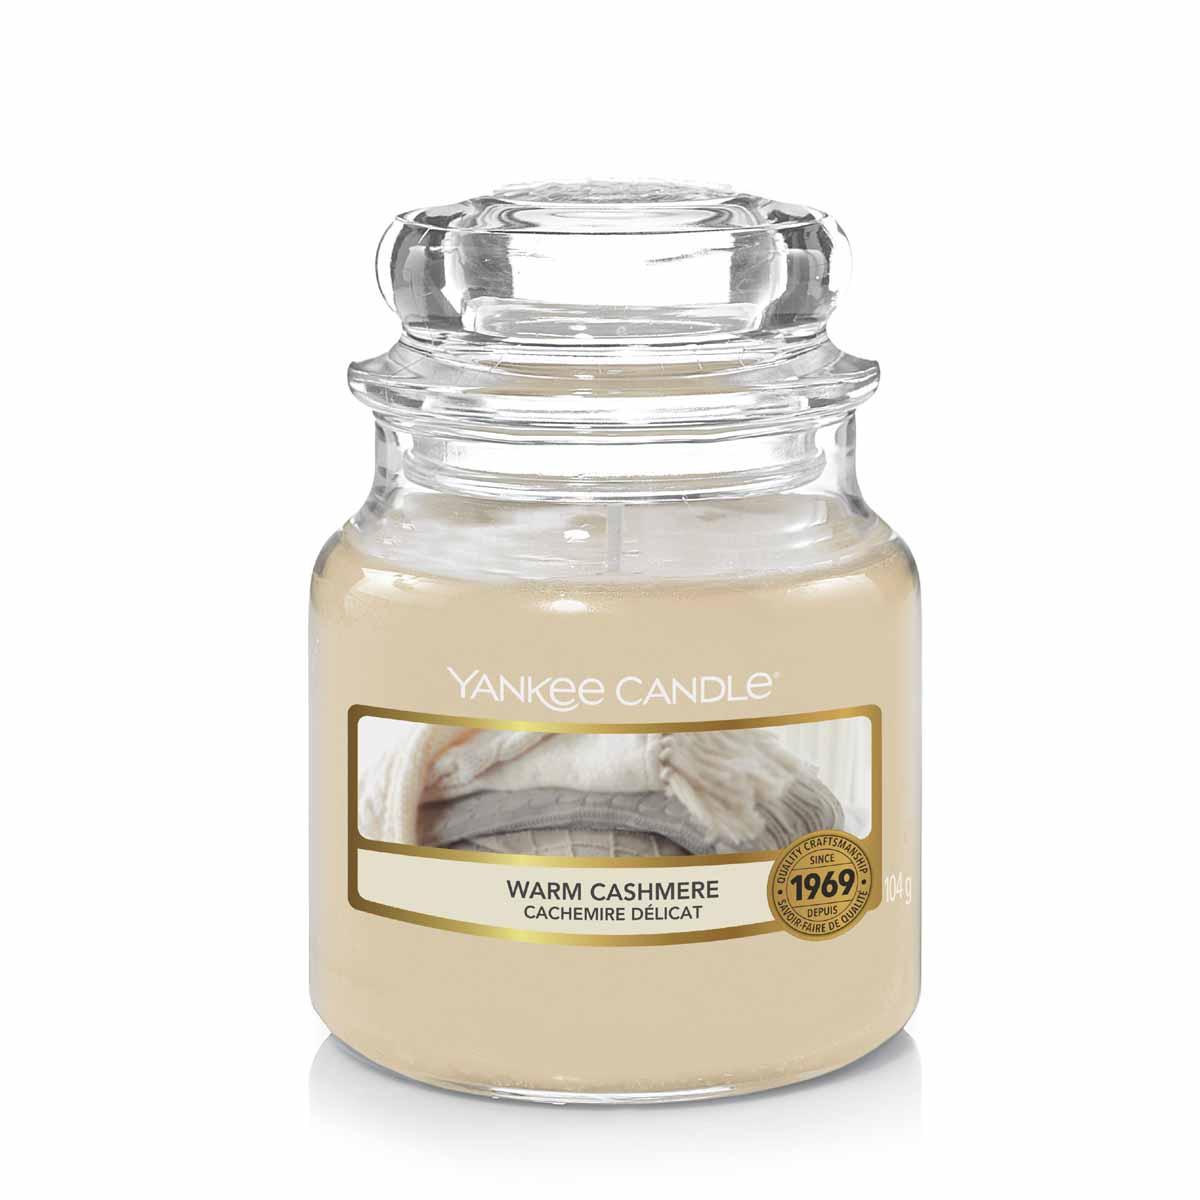 Yankee Candle Warm Cashmere Giara Piccola